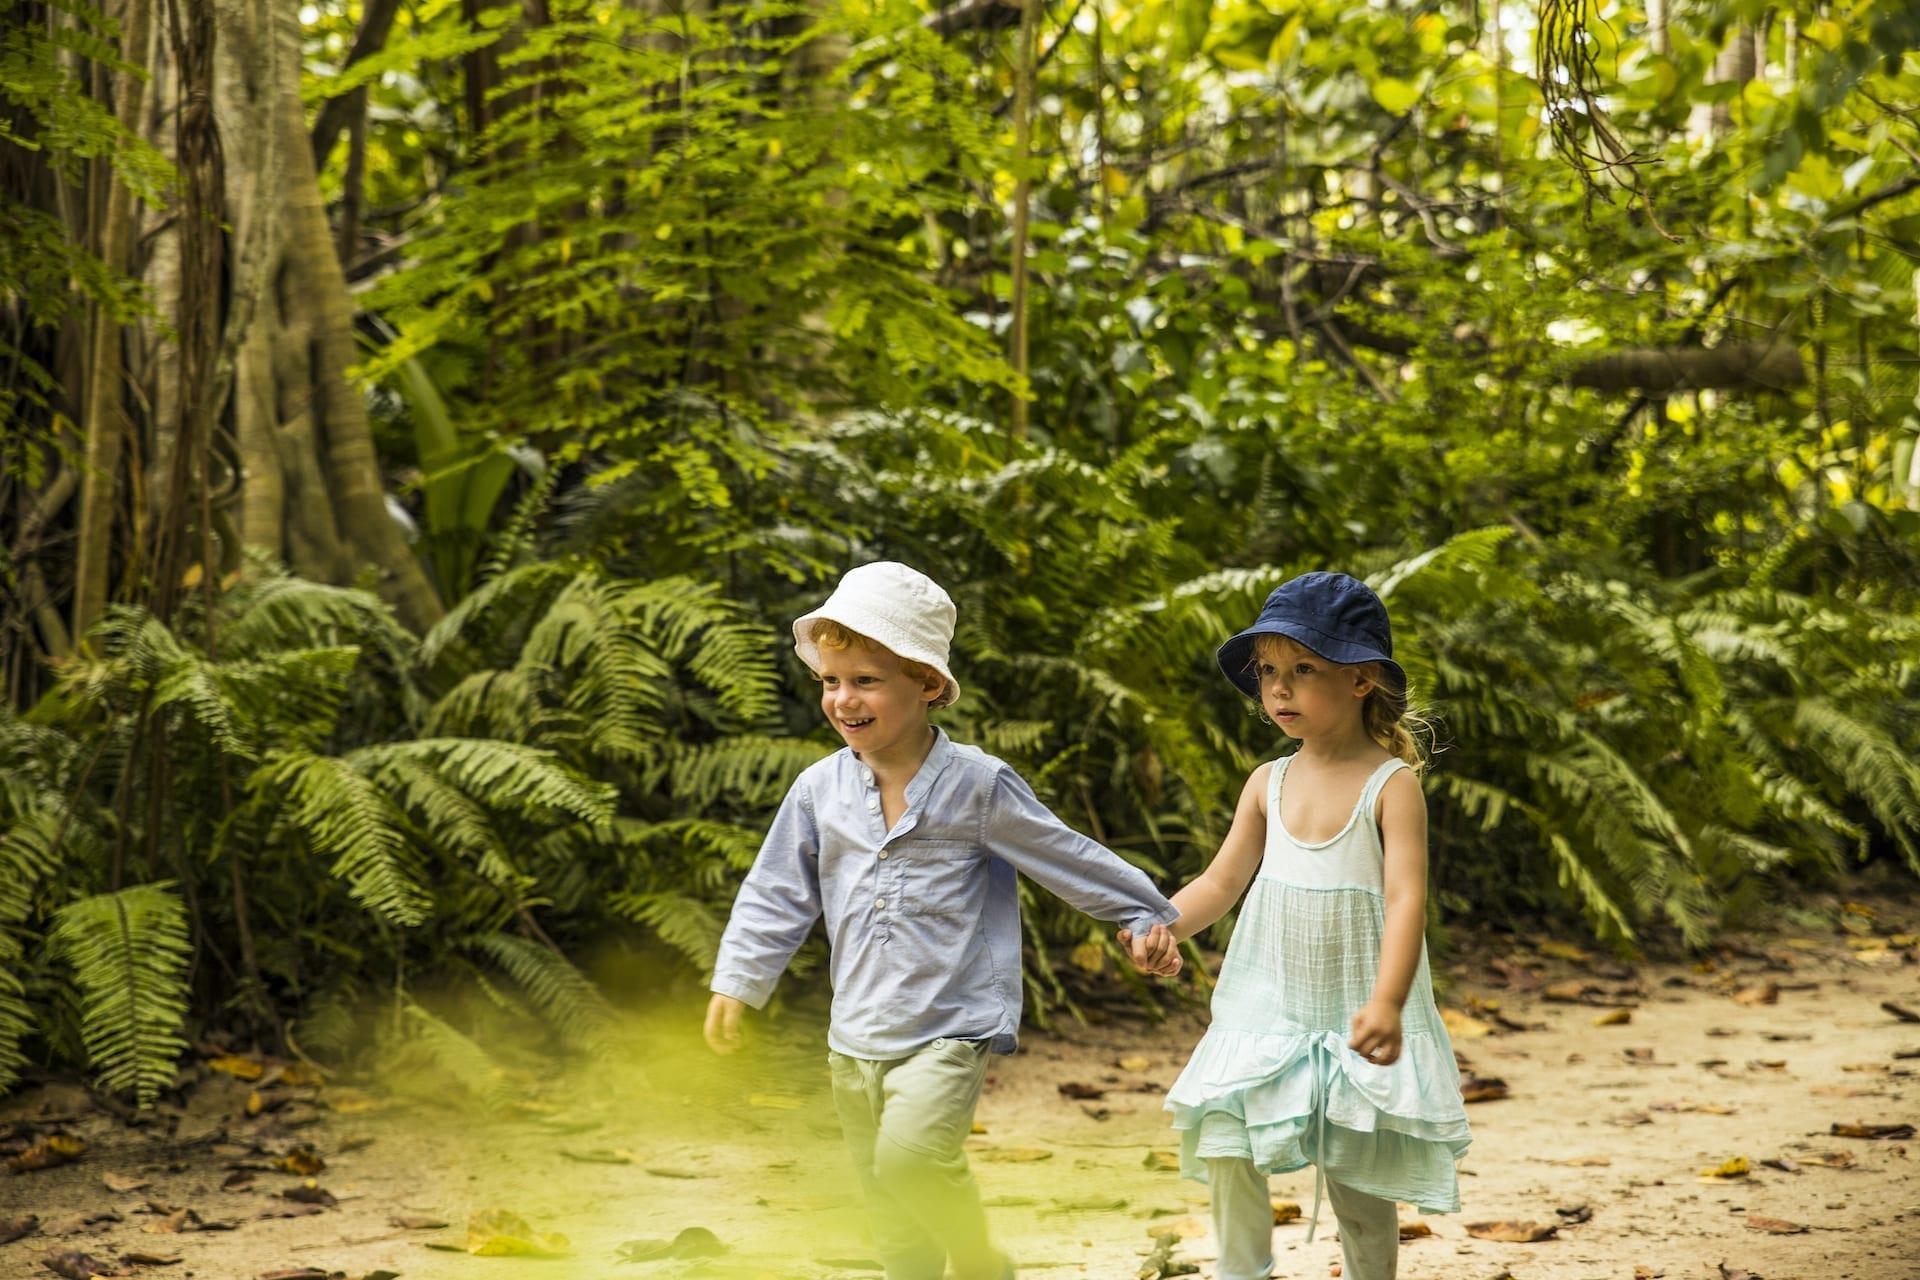 # FOTO - Denis - Kids Forest walk